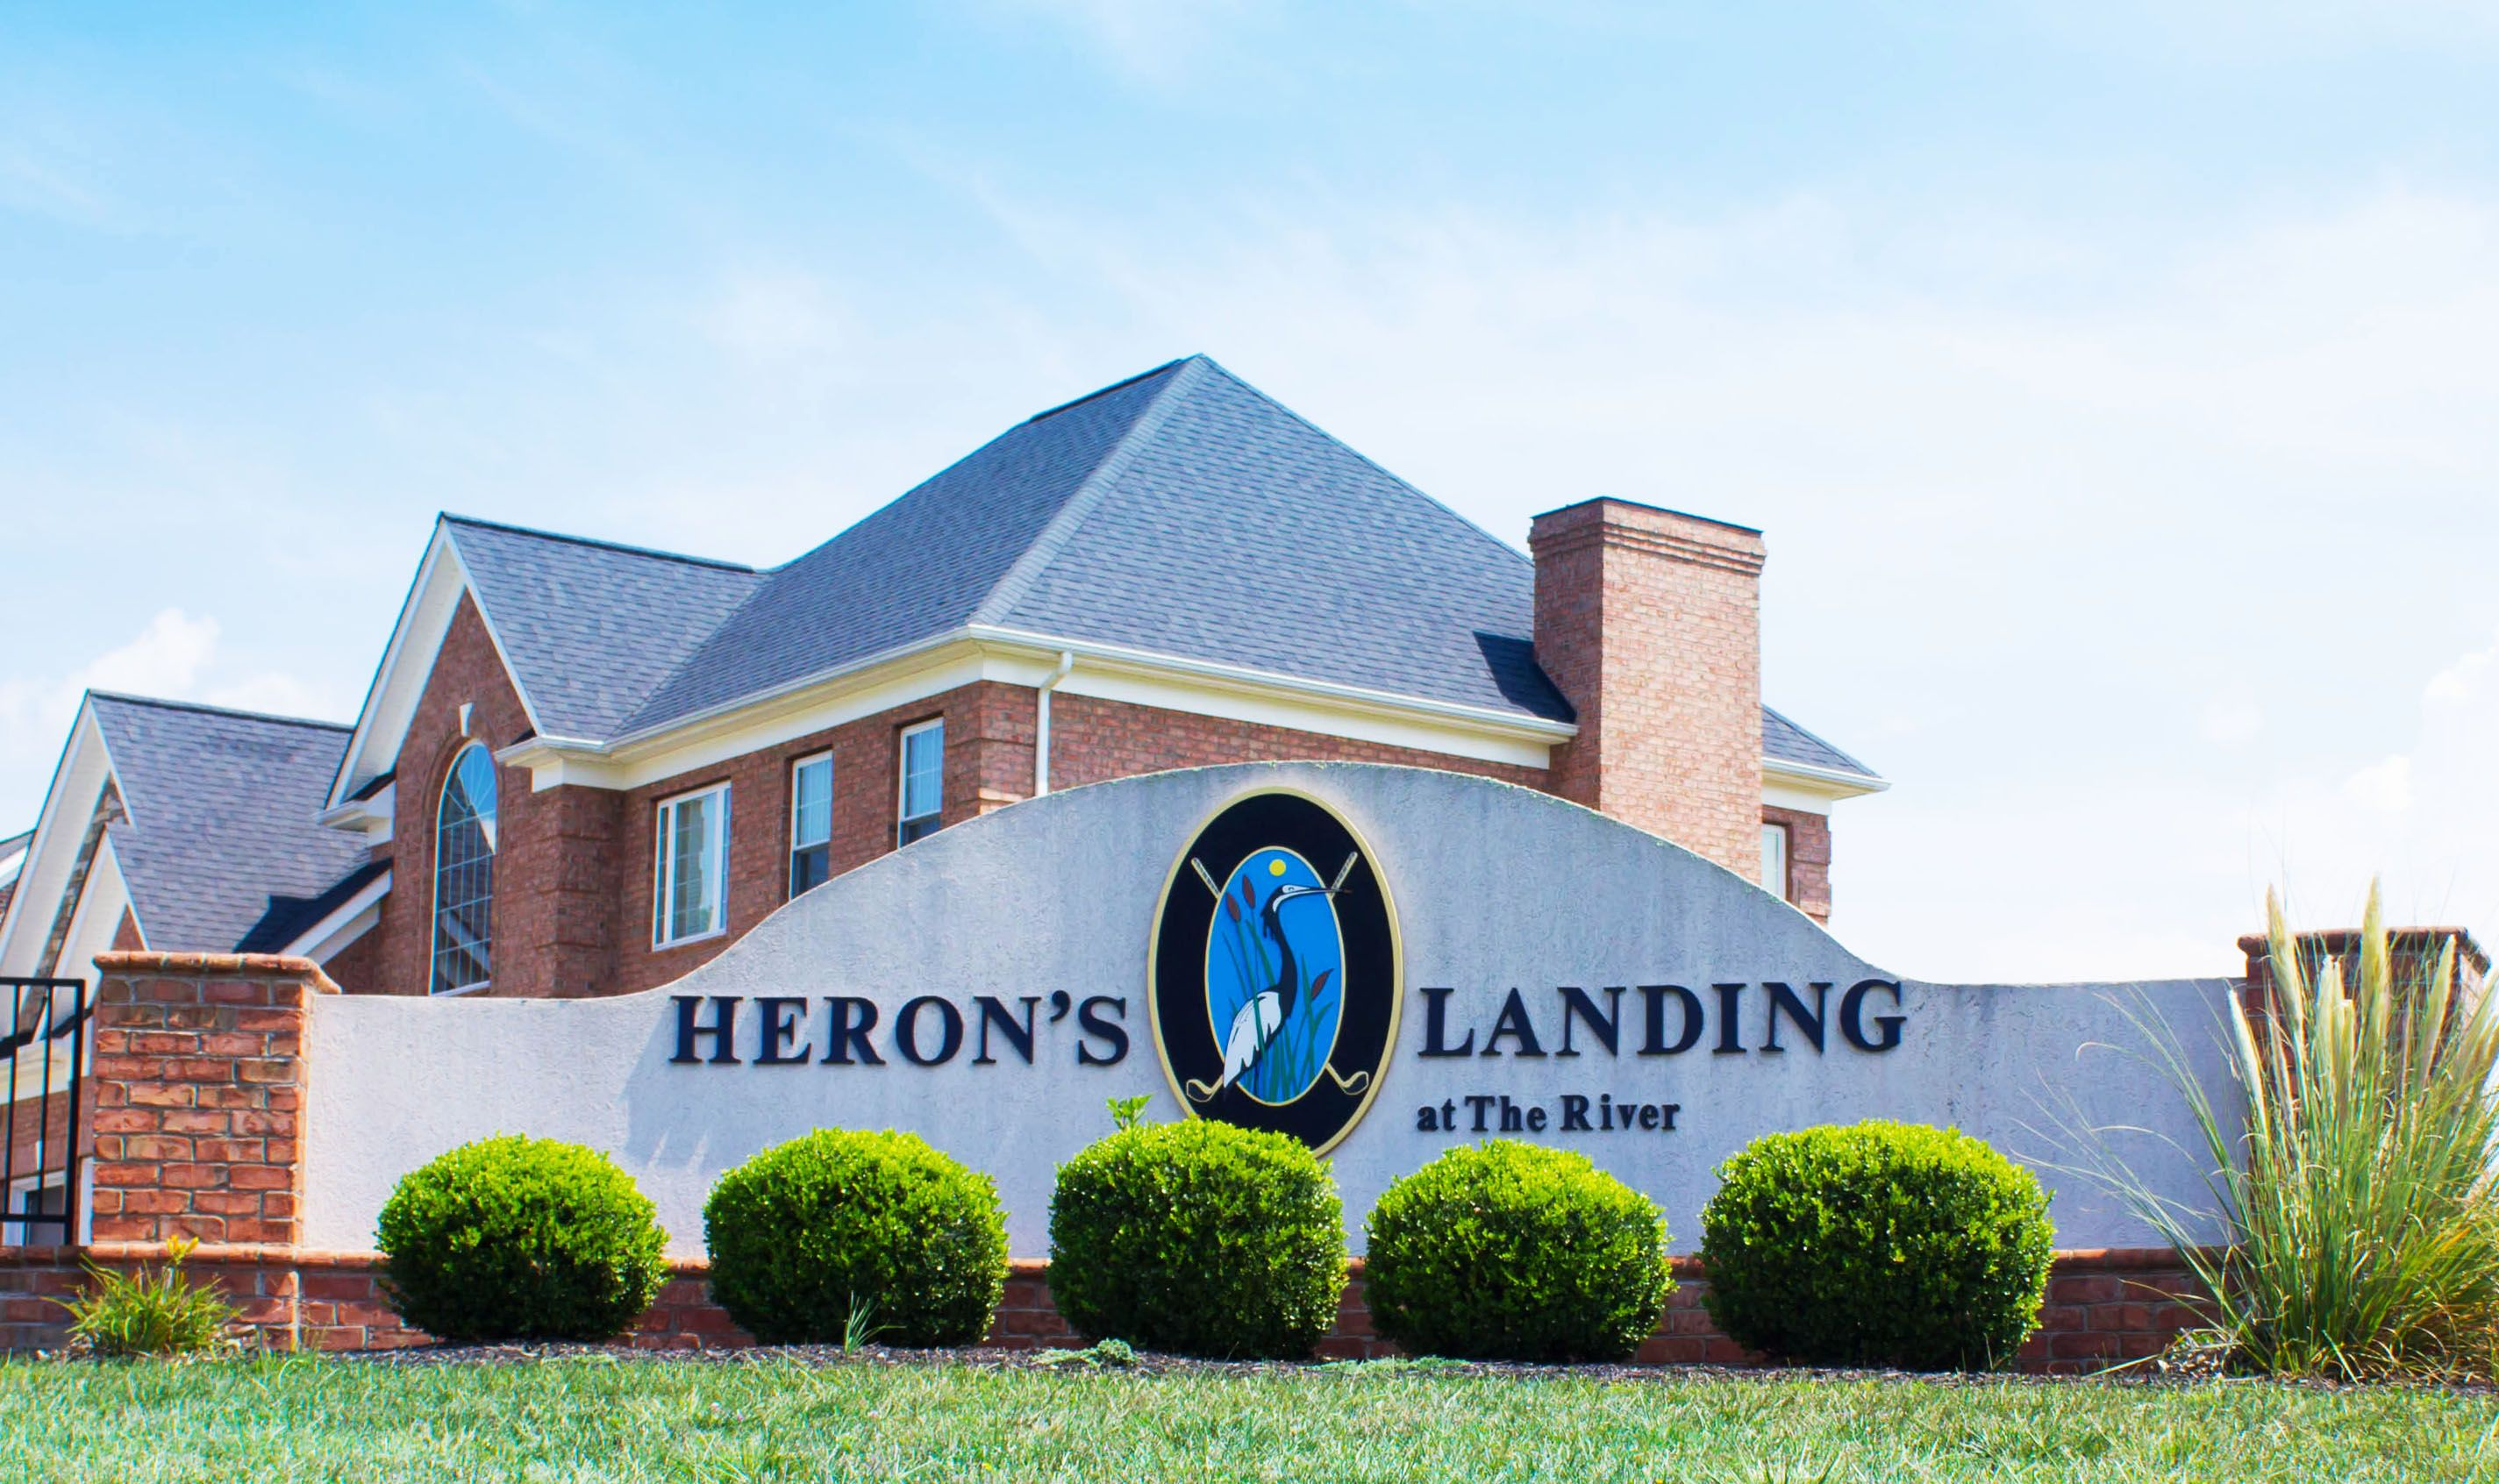 'Heron's Landing' by Stateson Homes in Blacksburg